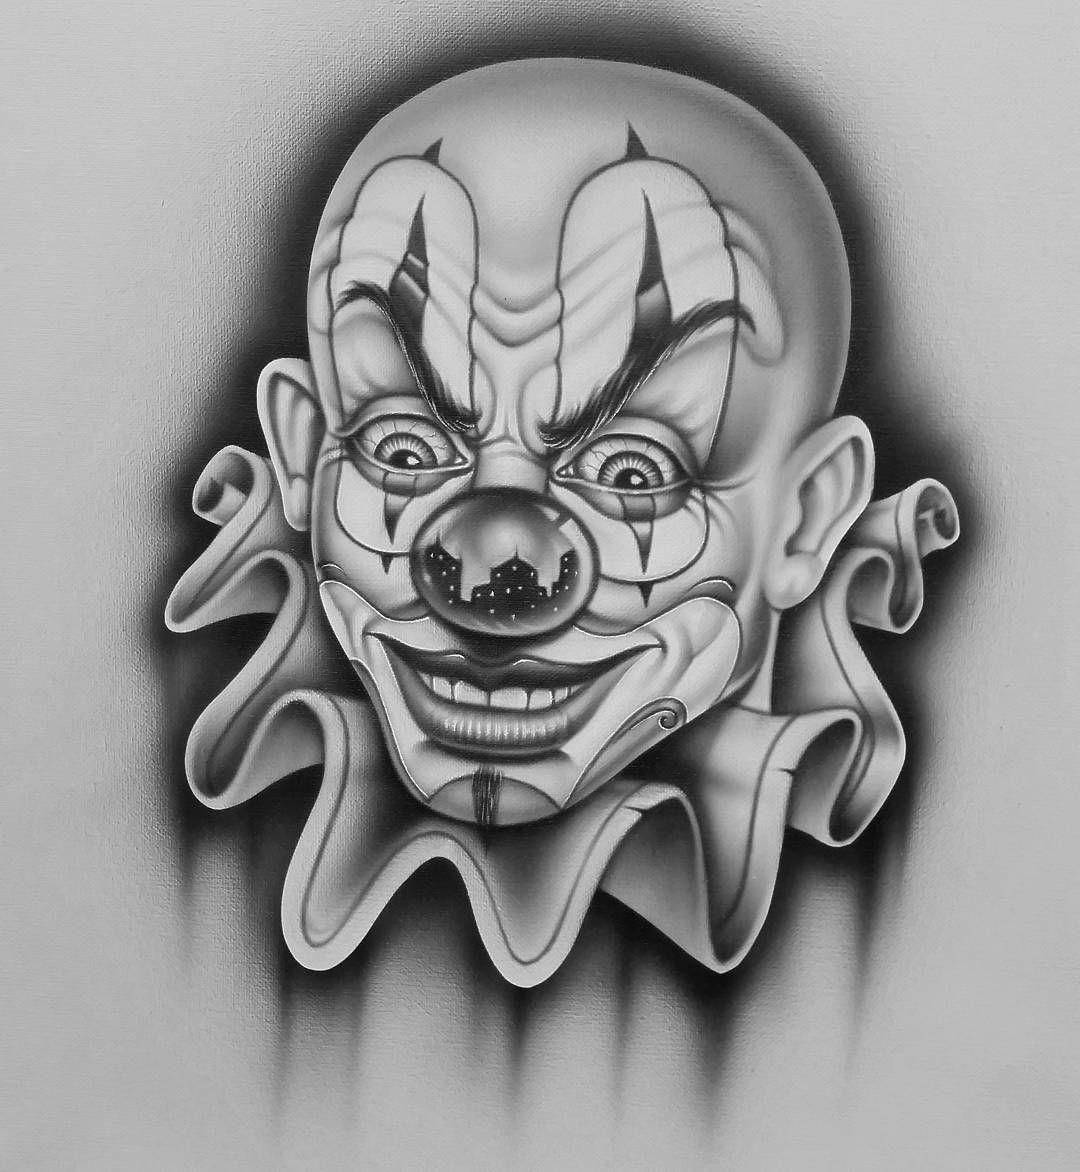 snls birthday clown sketch - 735×798